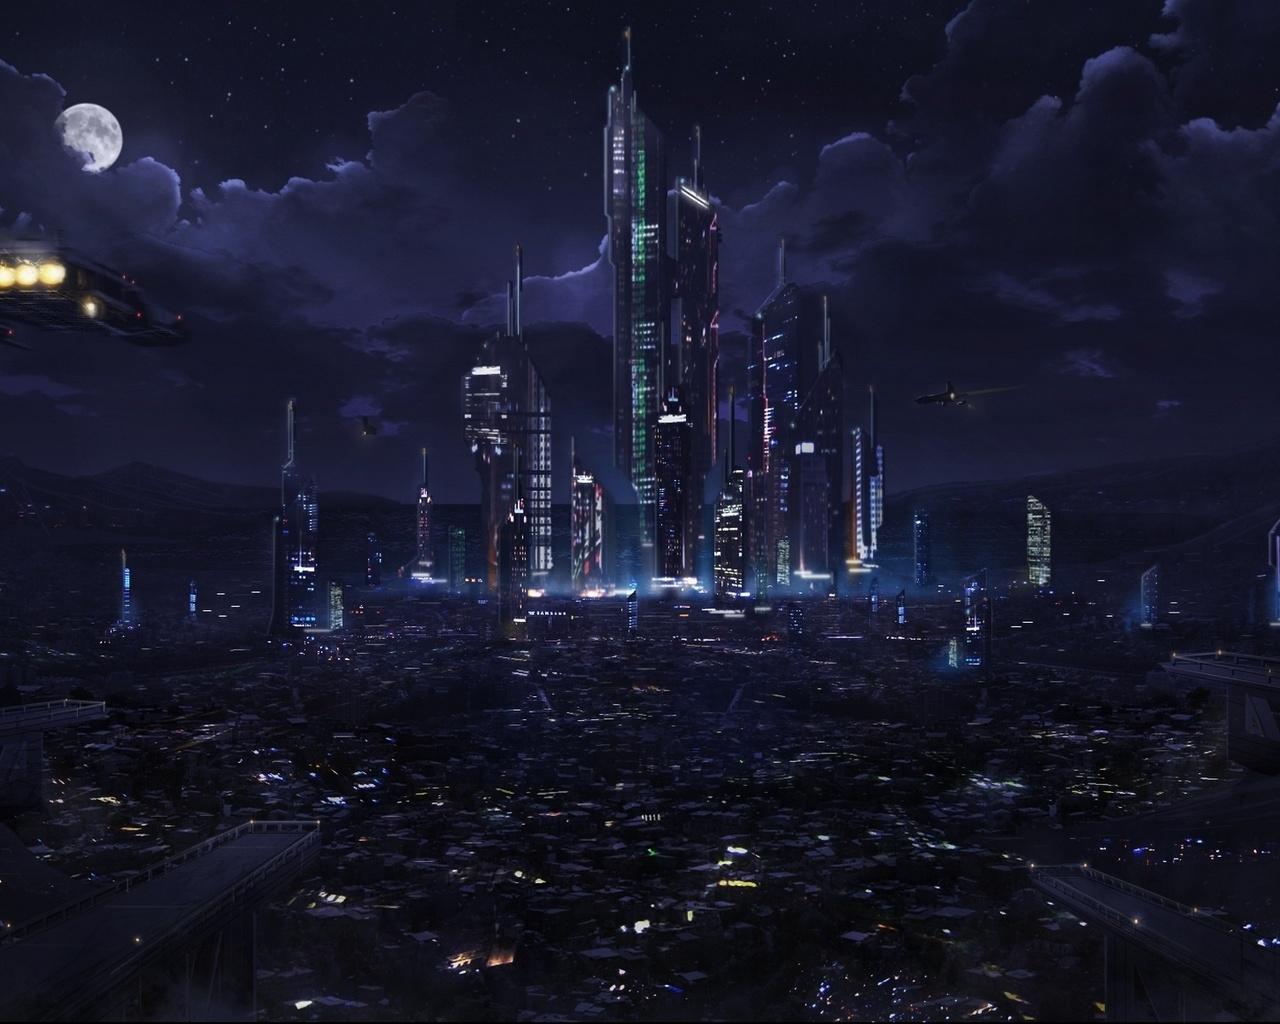 ken lebras, spaceships, Plaza, future, city, lights, moon, sky, night, fantasy, clouds, astrokevin